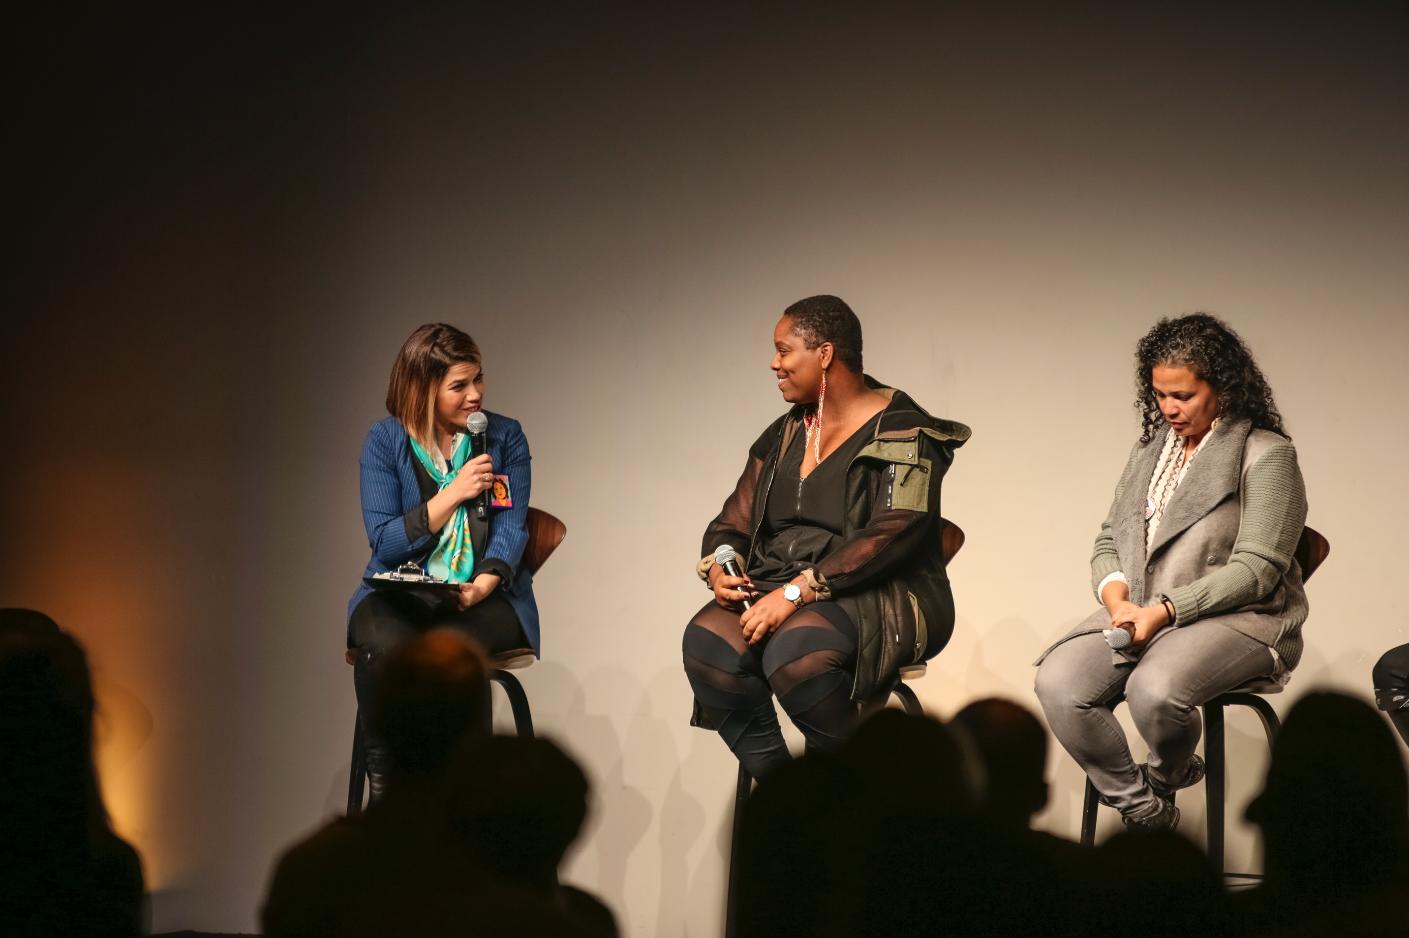 America Ferrera, Patrisse Khan-Cullors (Black Lives Matter), Melina Abdullah (BLM)